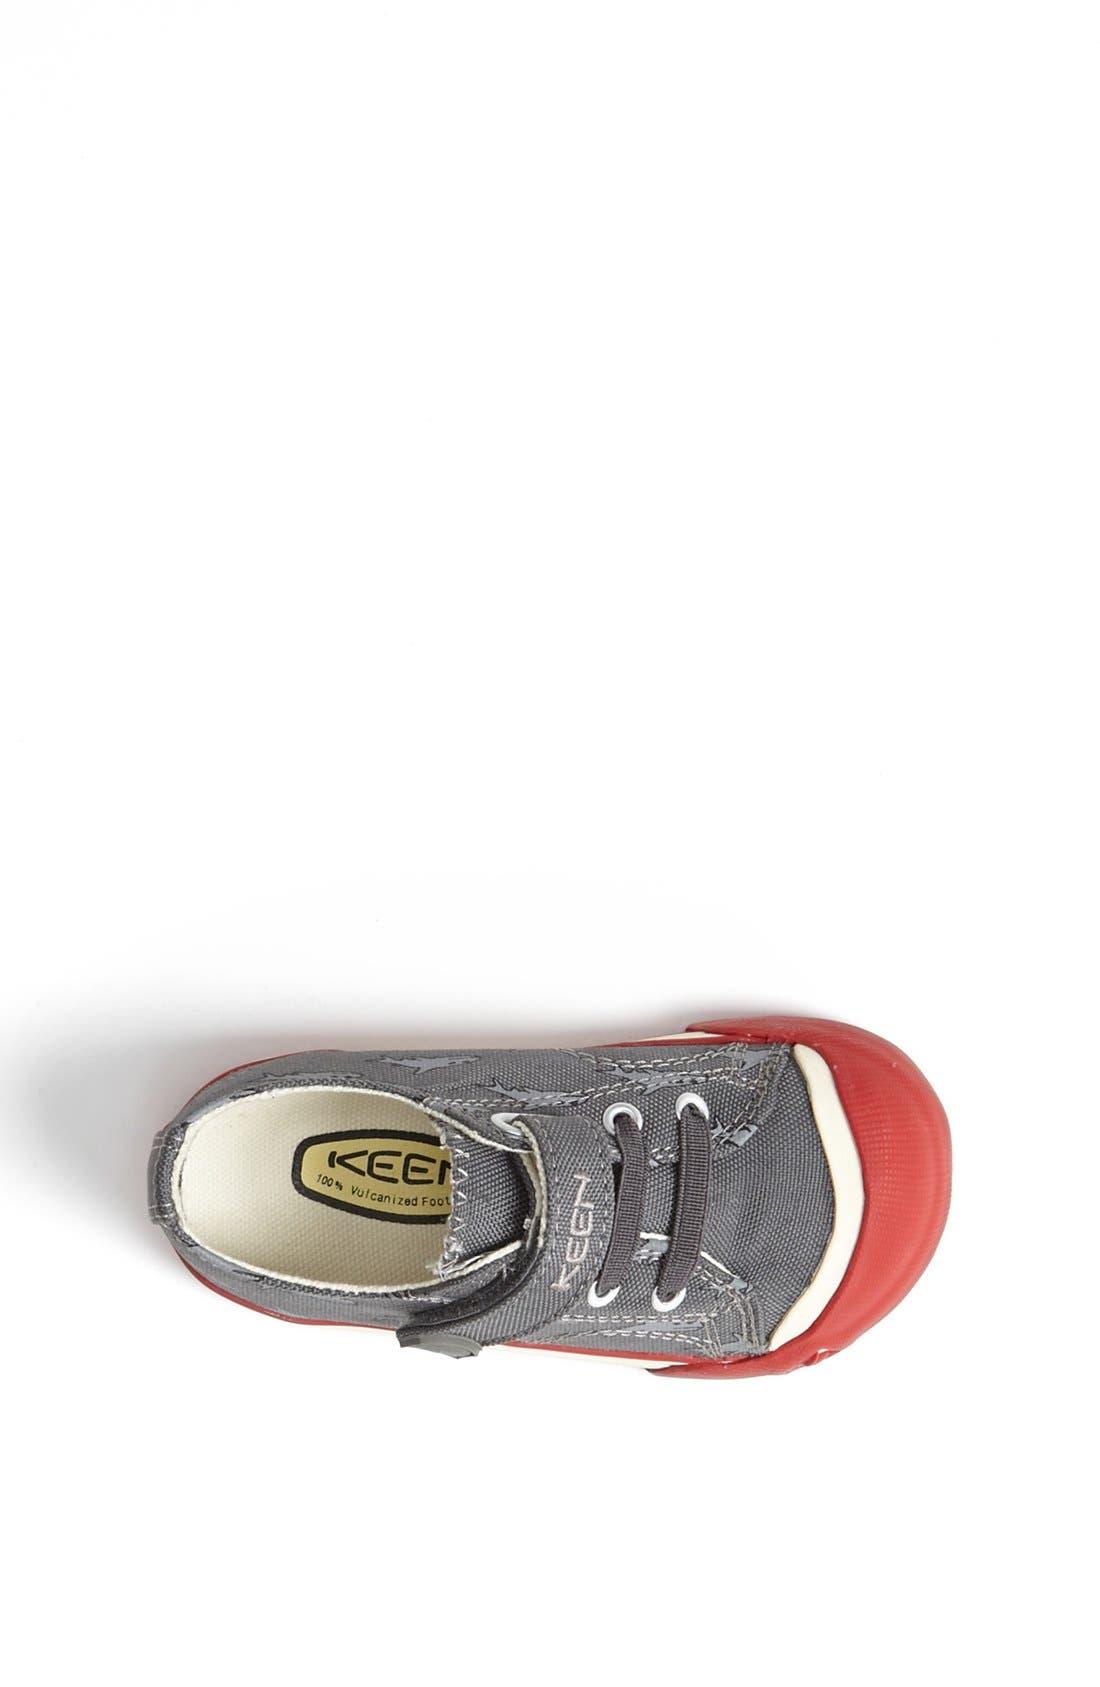 Alternate Image 3  - Keen 'Coronado' Print Sneaker (Baby, Walker, Toddler, Little Kids)